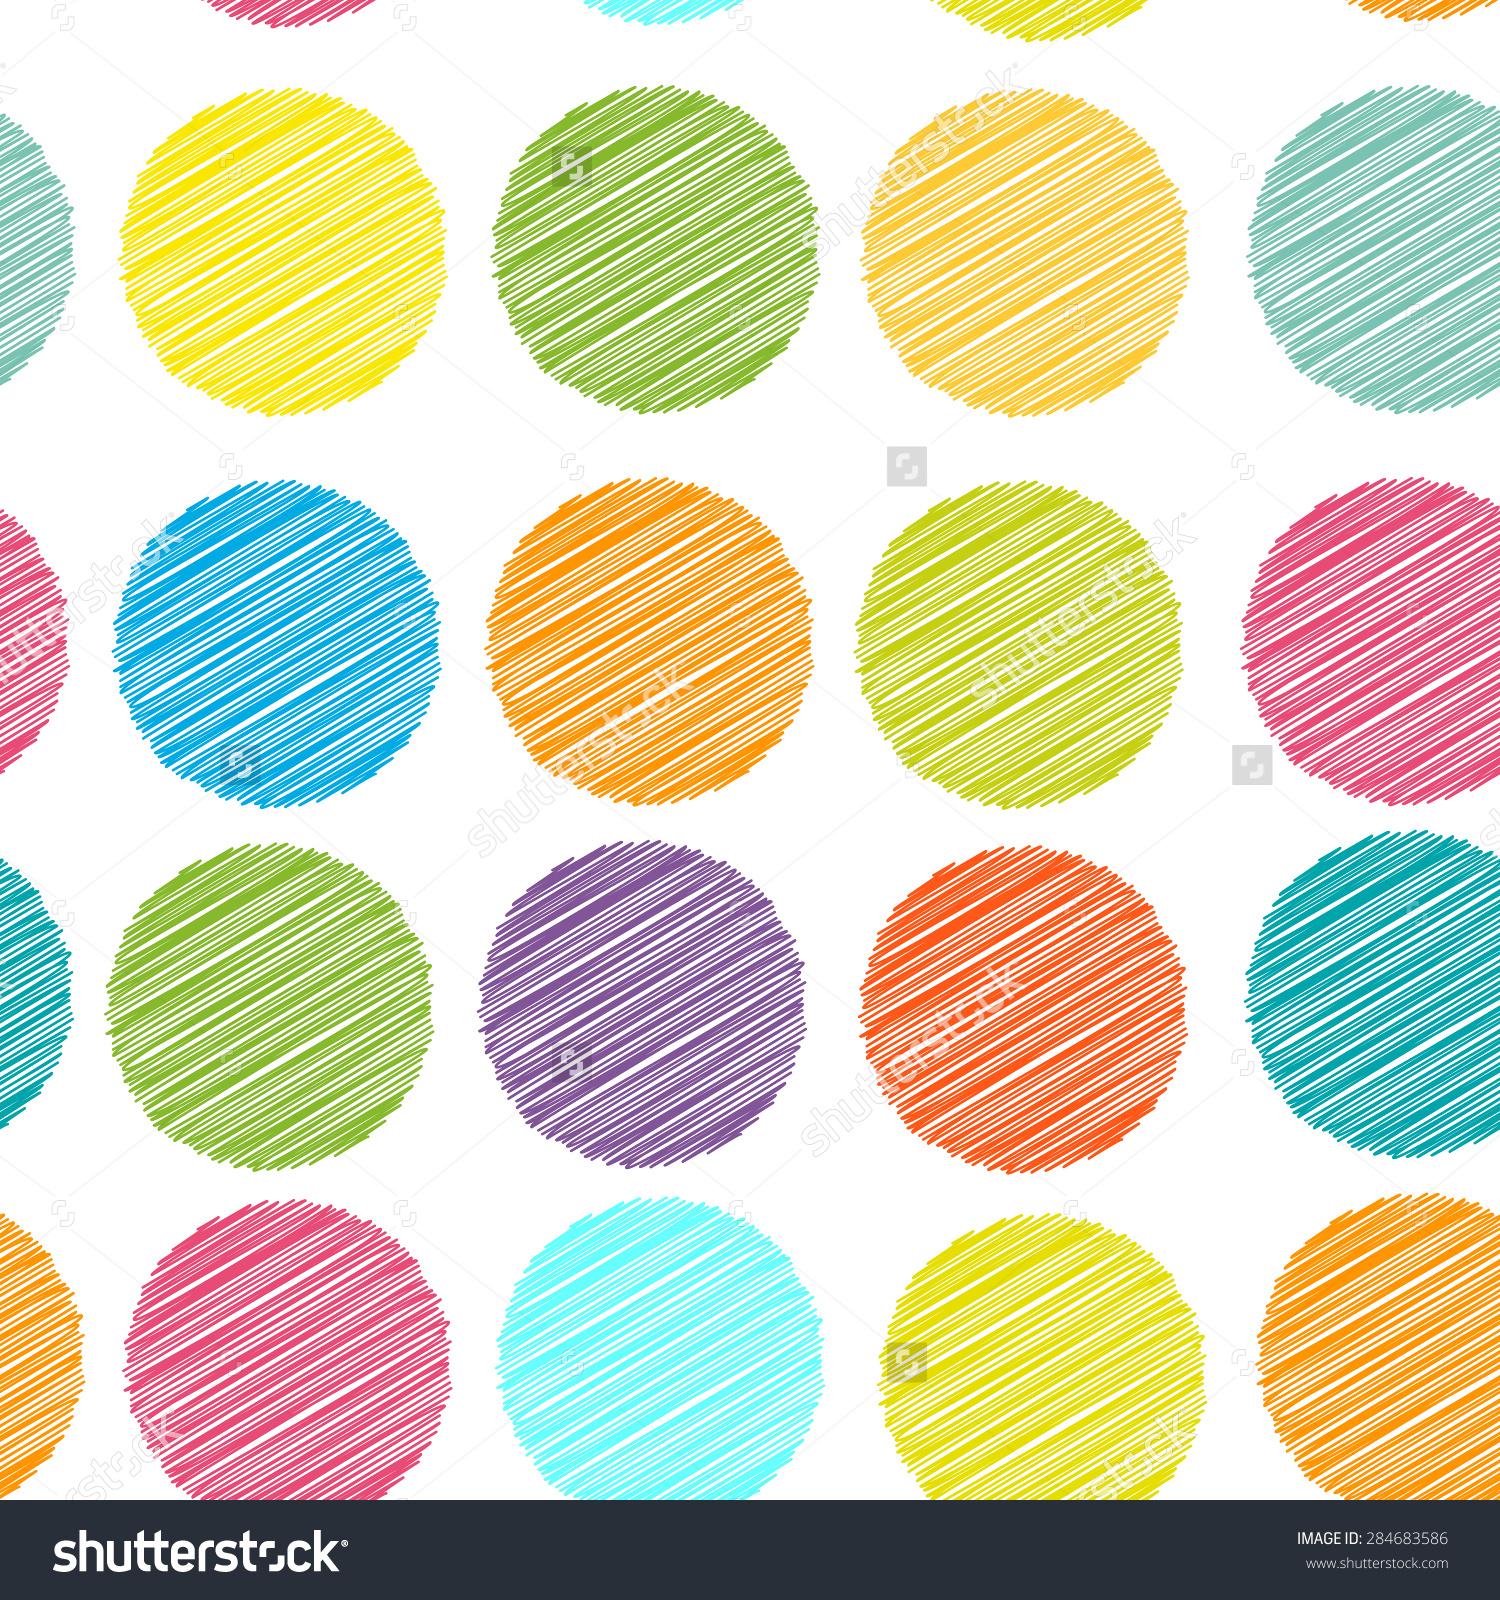 Dots clipart rainbow #5